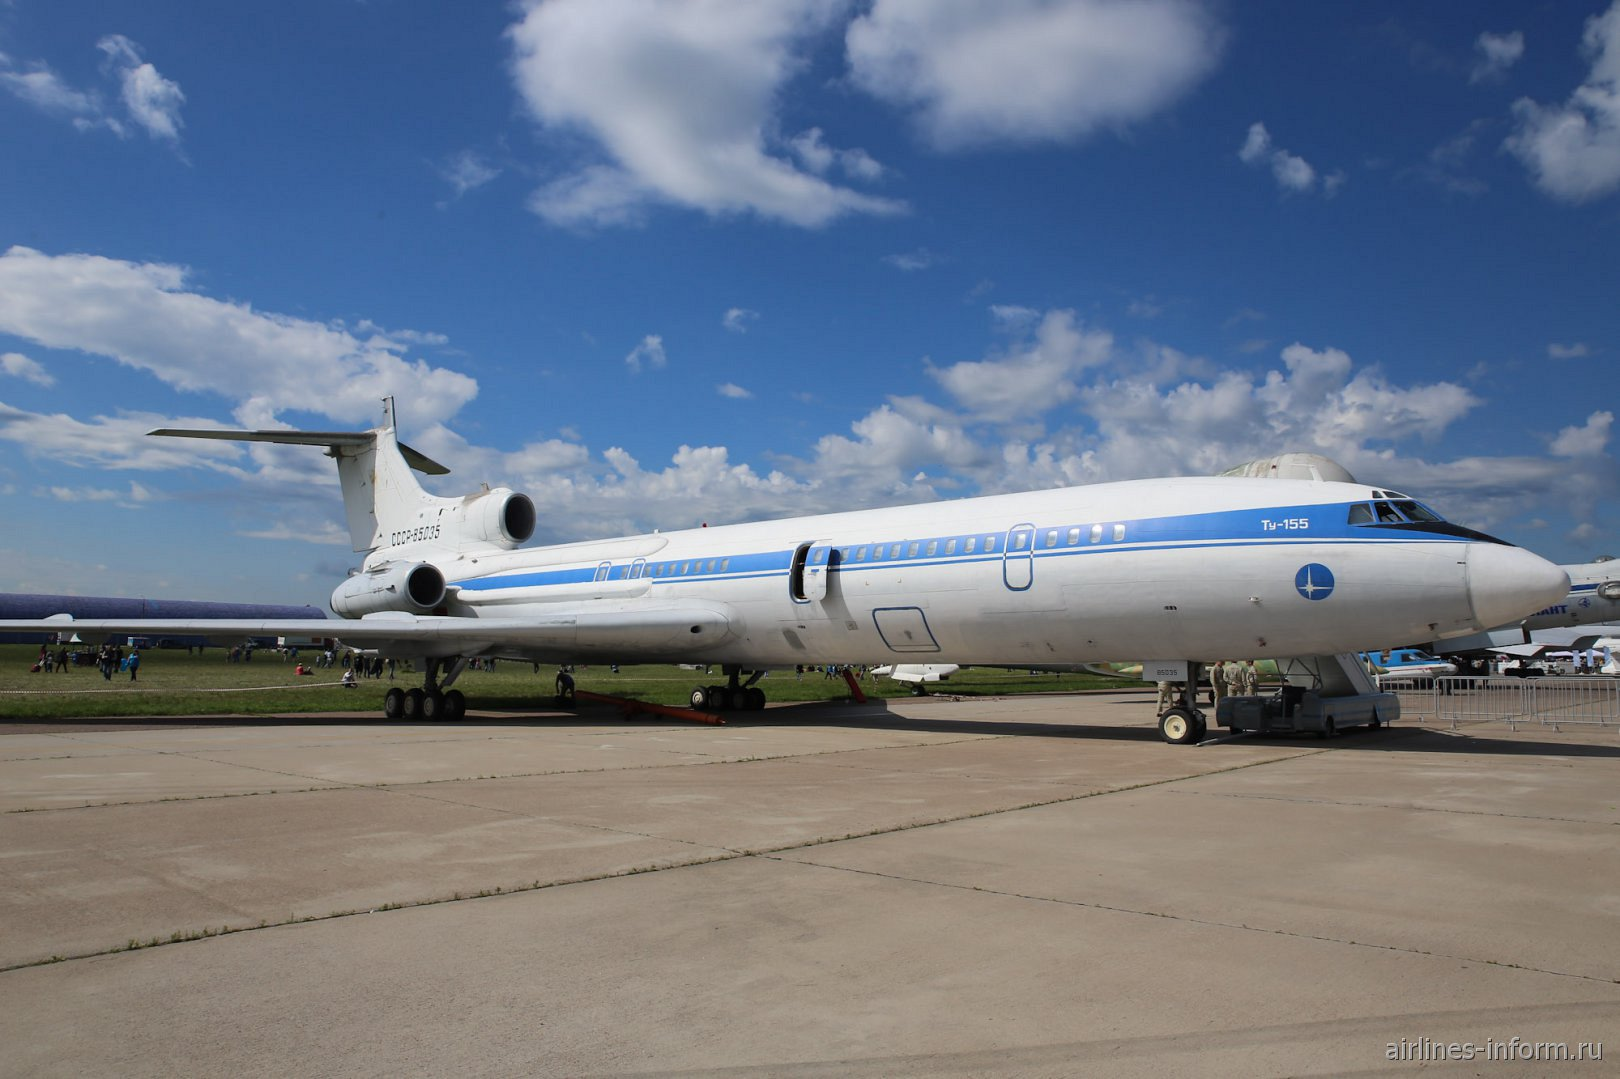 Самолет Ту-155 на авиасалоне МАКС-2017